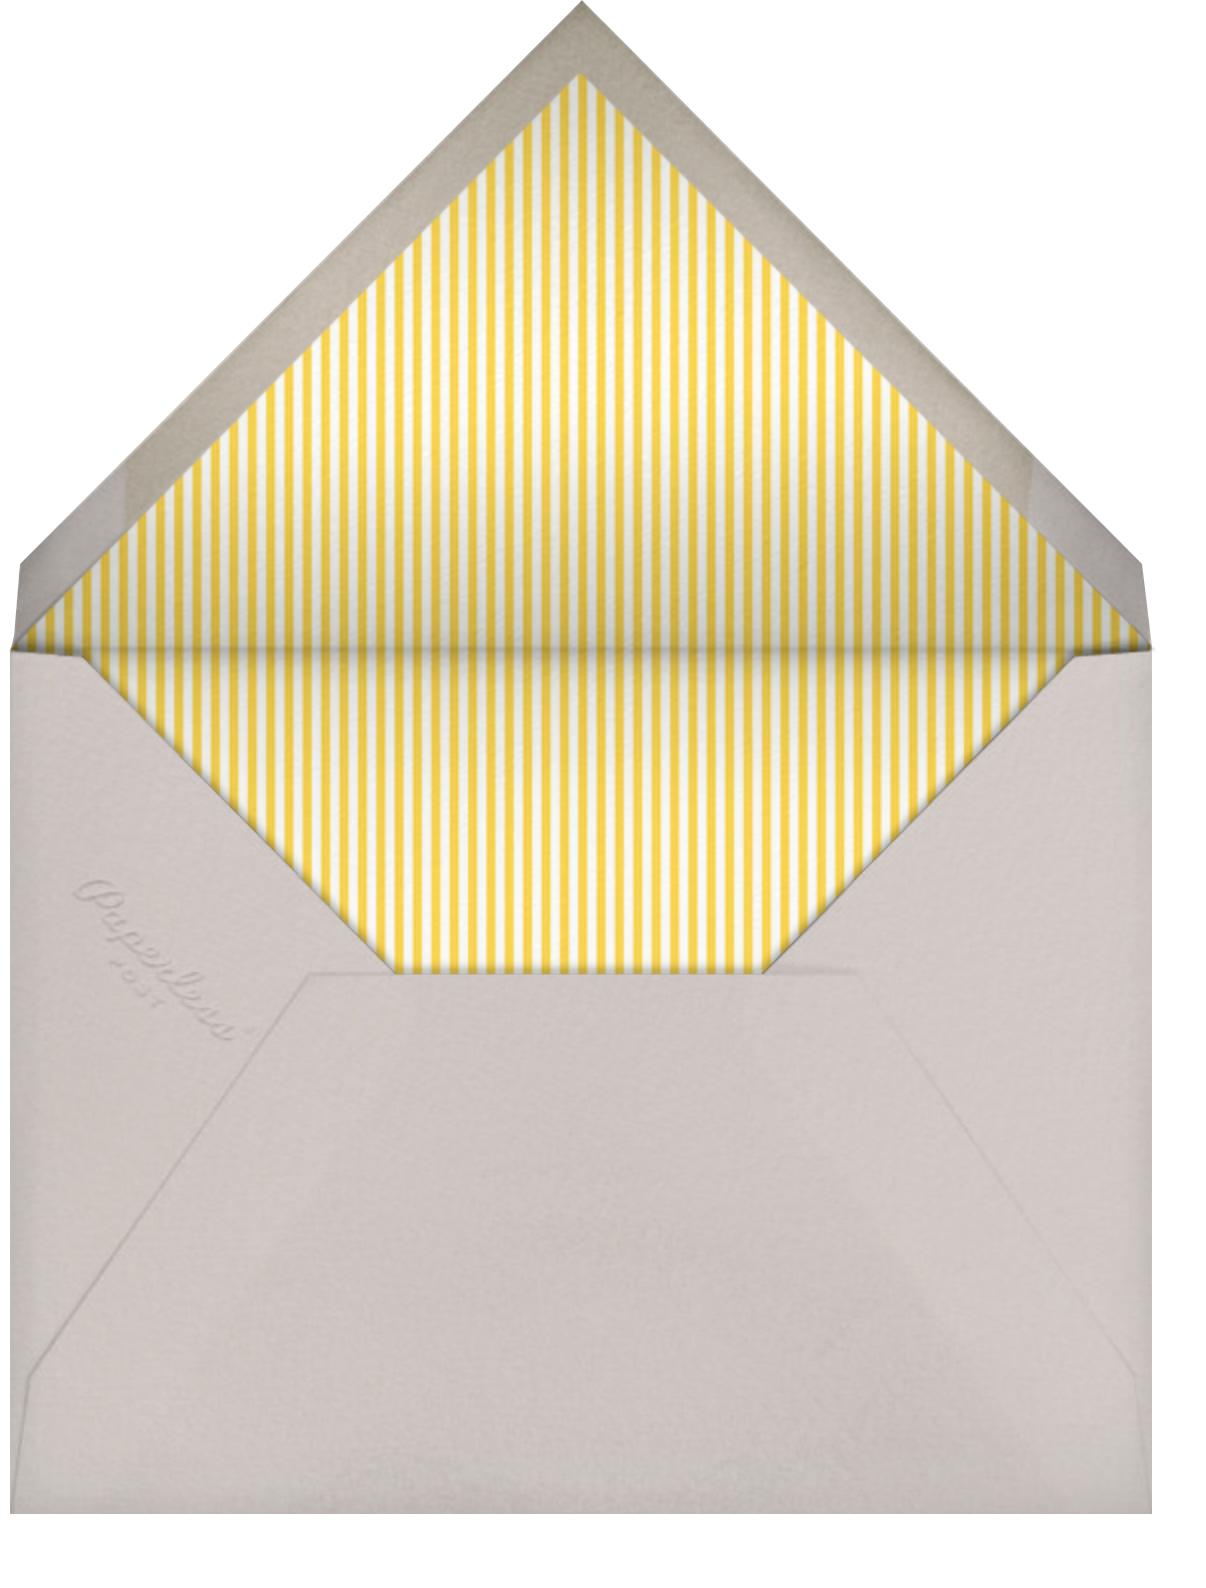 Ellie's Balloon (Photo) - Yellow - Little Cube - Baby boy announcements - envelope back